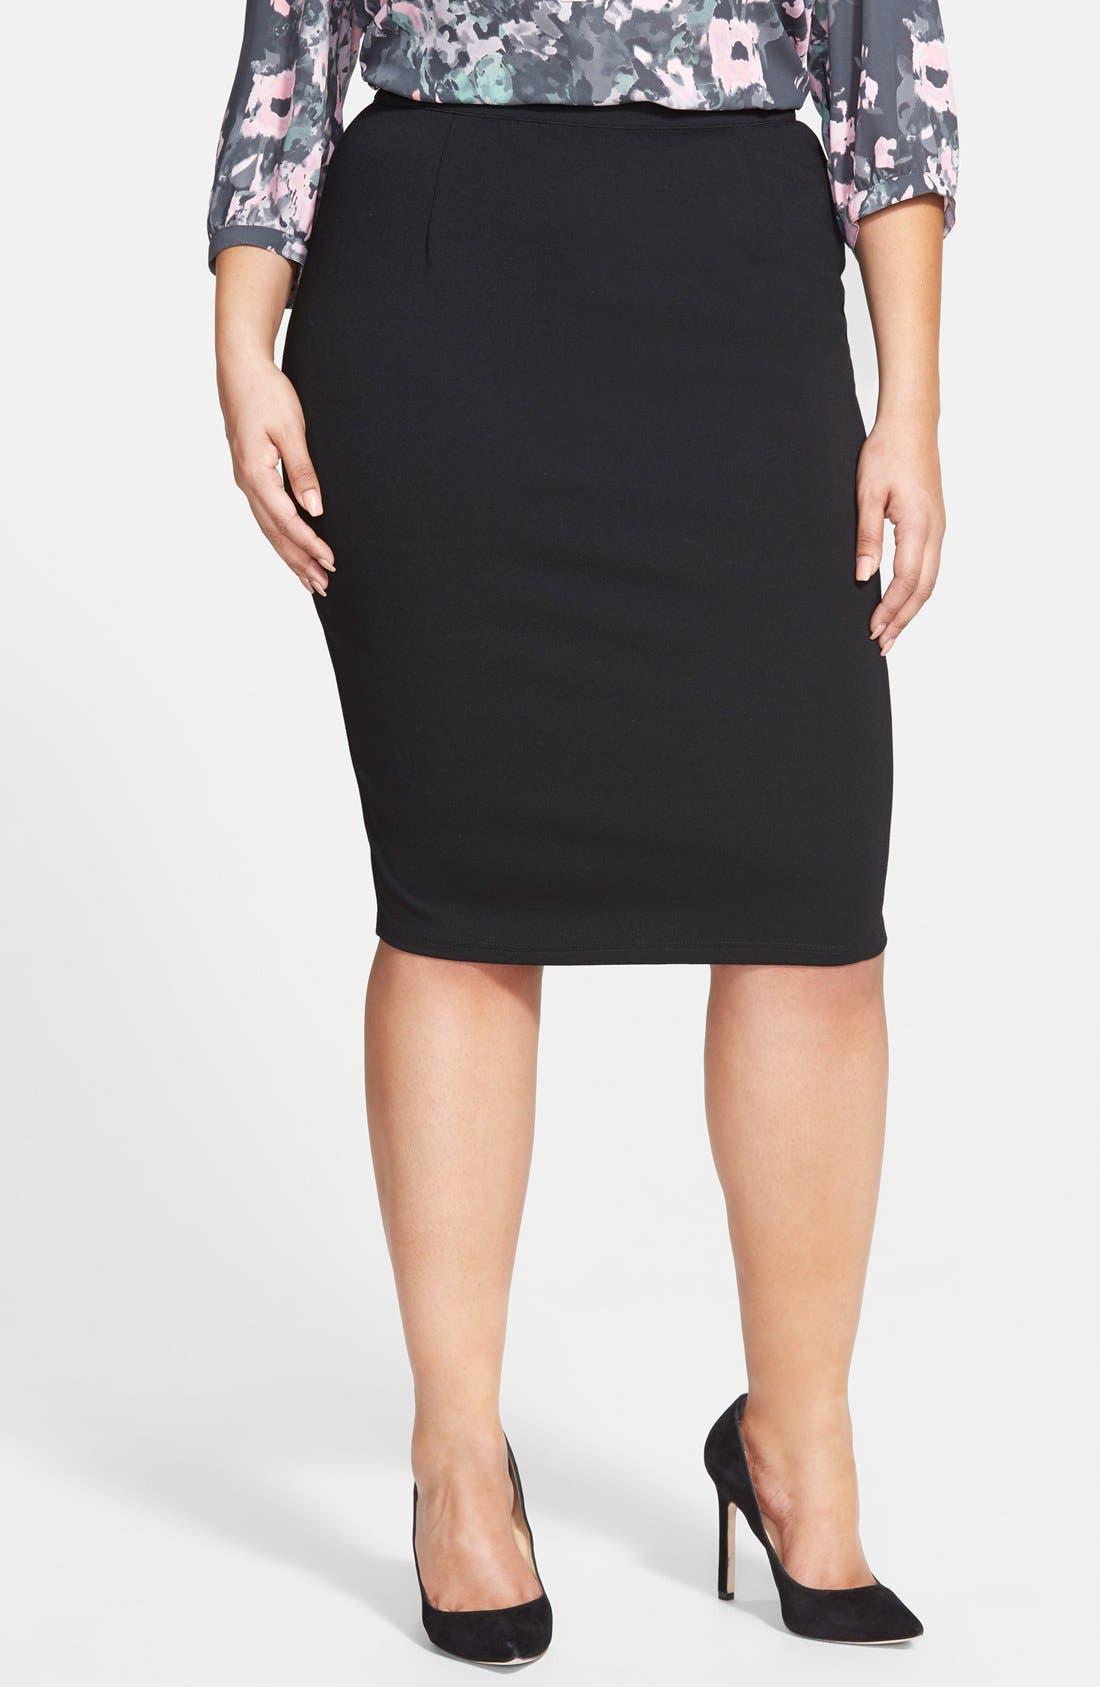 Alternate Image 1 Selected - City Chic Back Zip Tube Skirt (Plus Size)